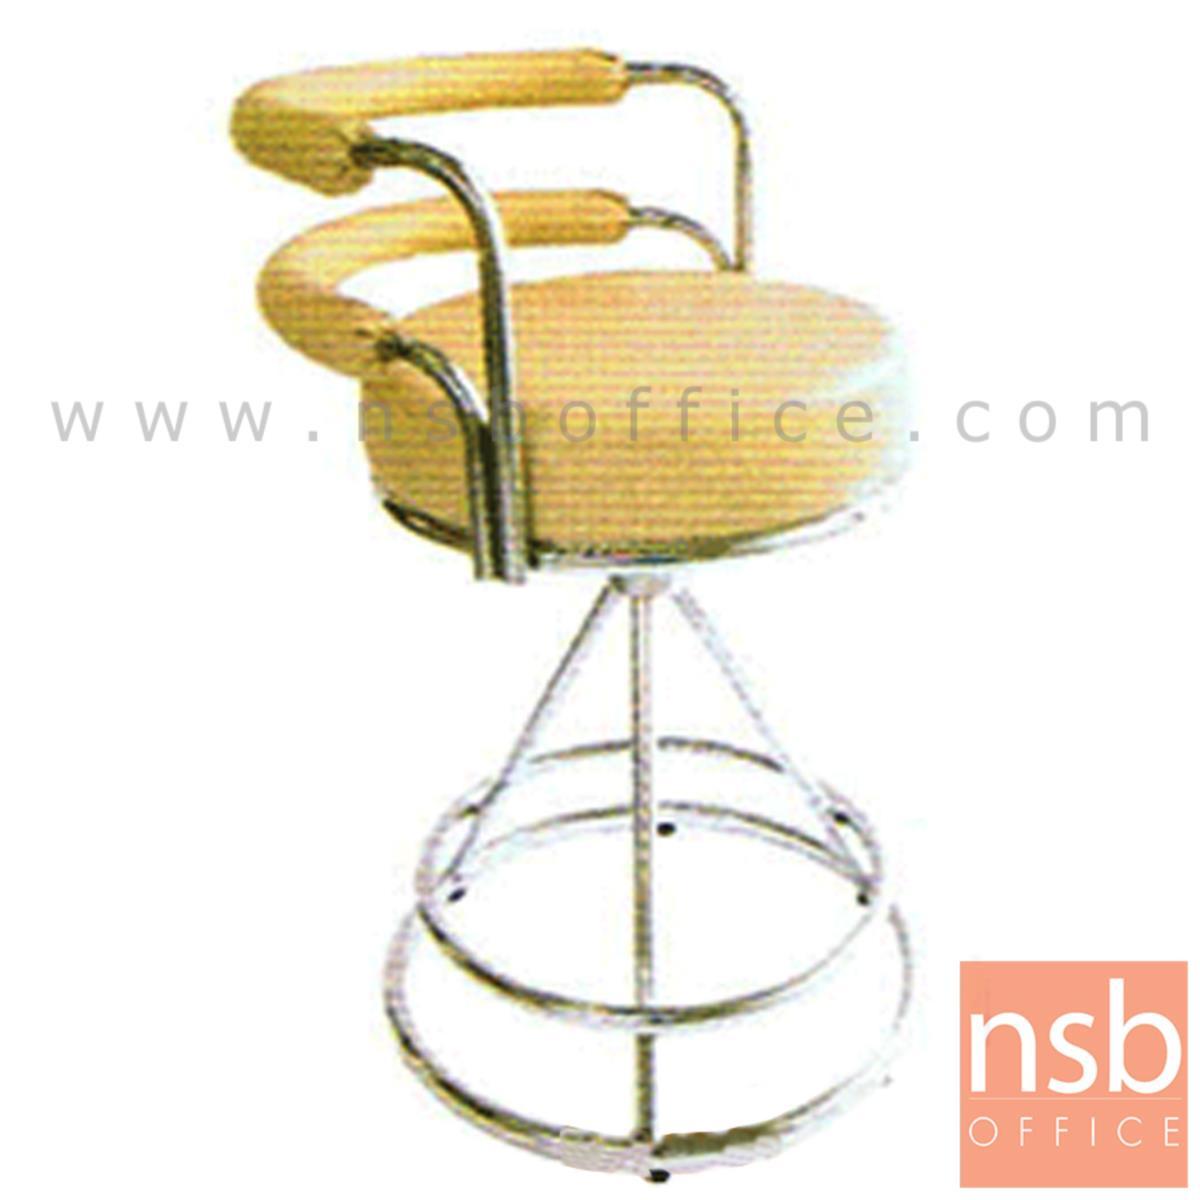 B09A003:เก้าอี้บาร์ที่นั่งกลม รุ่น CS-019 ขาเหล็ก